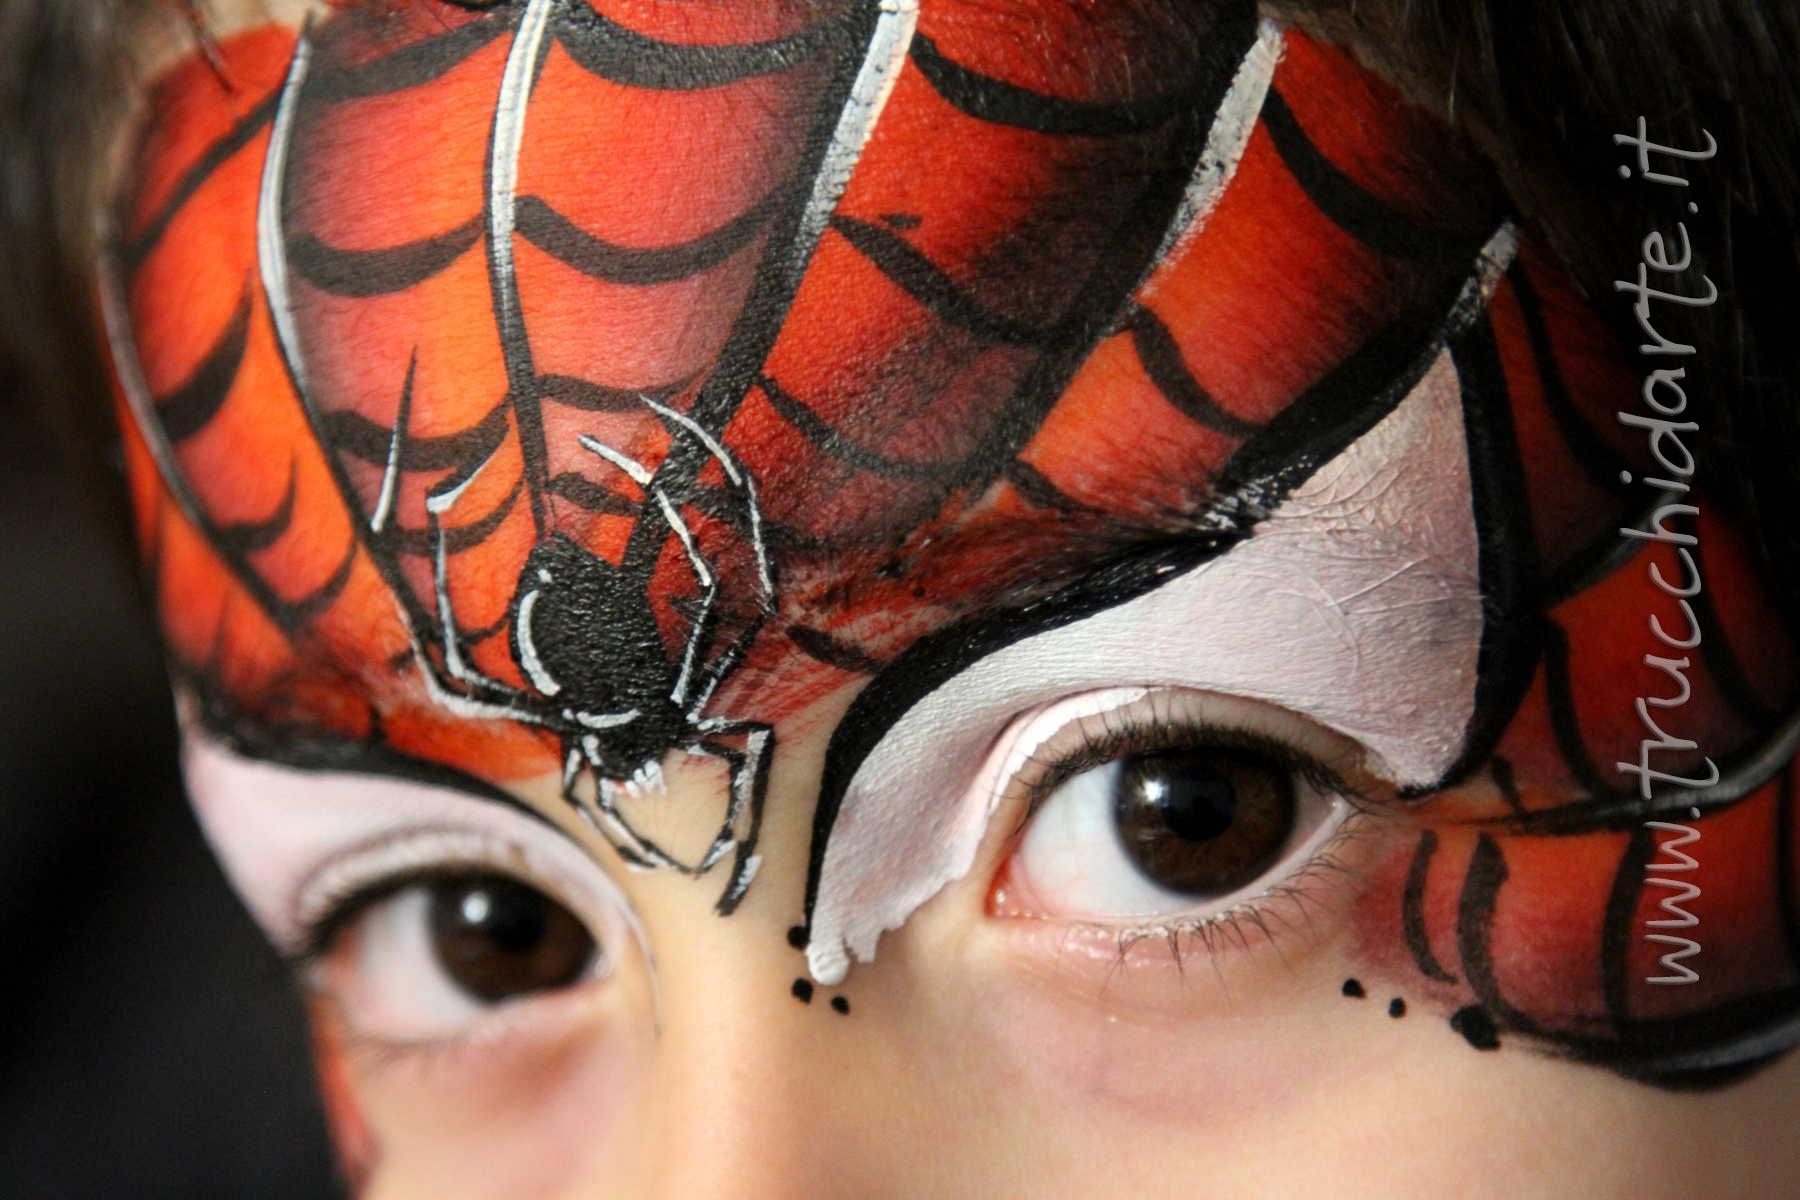 Estremamente spidereyes - Trucchi d'Arte WH49